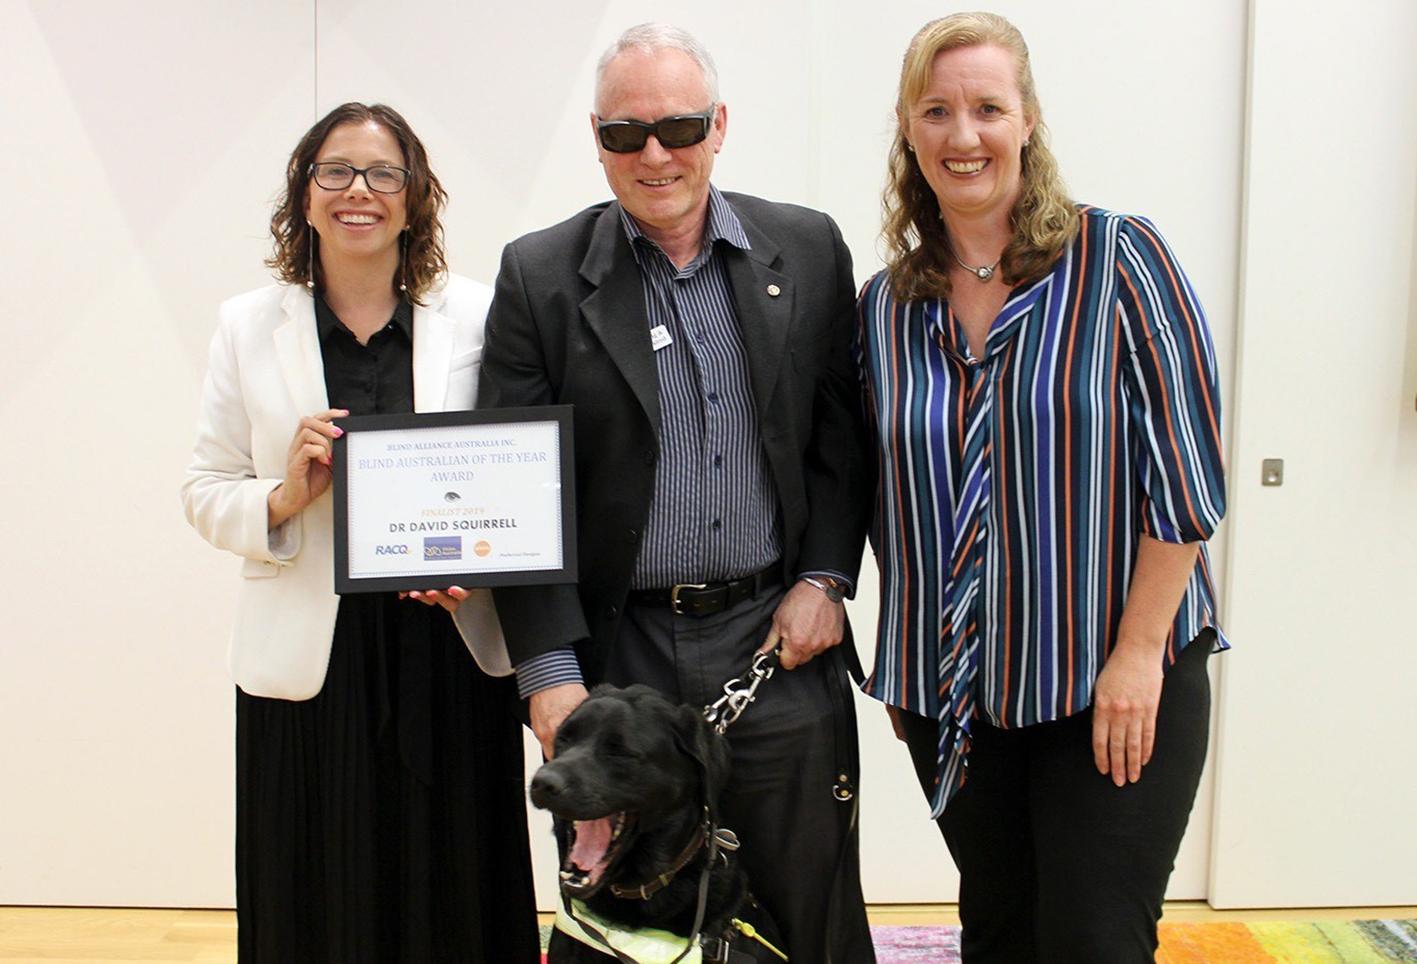 Amanda Rishworth presents an award for Australian Blind Person of the Year